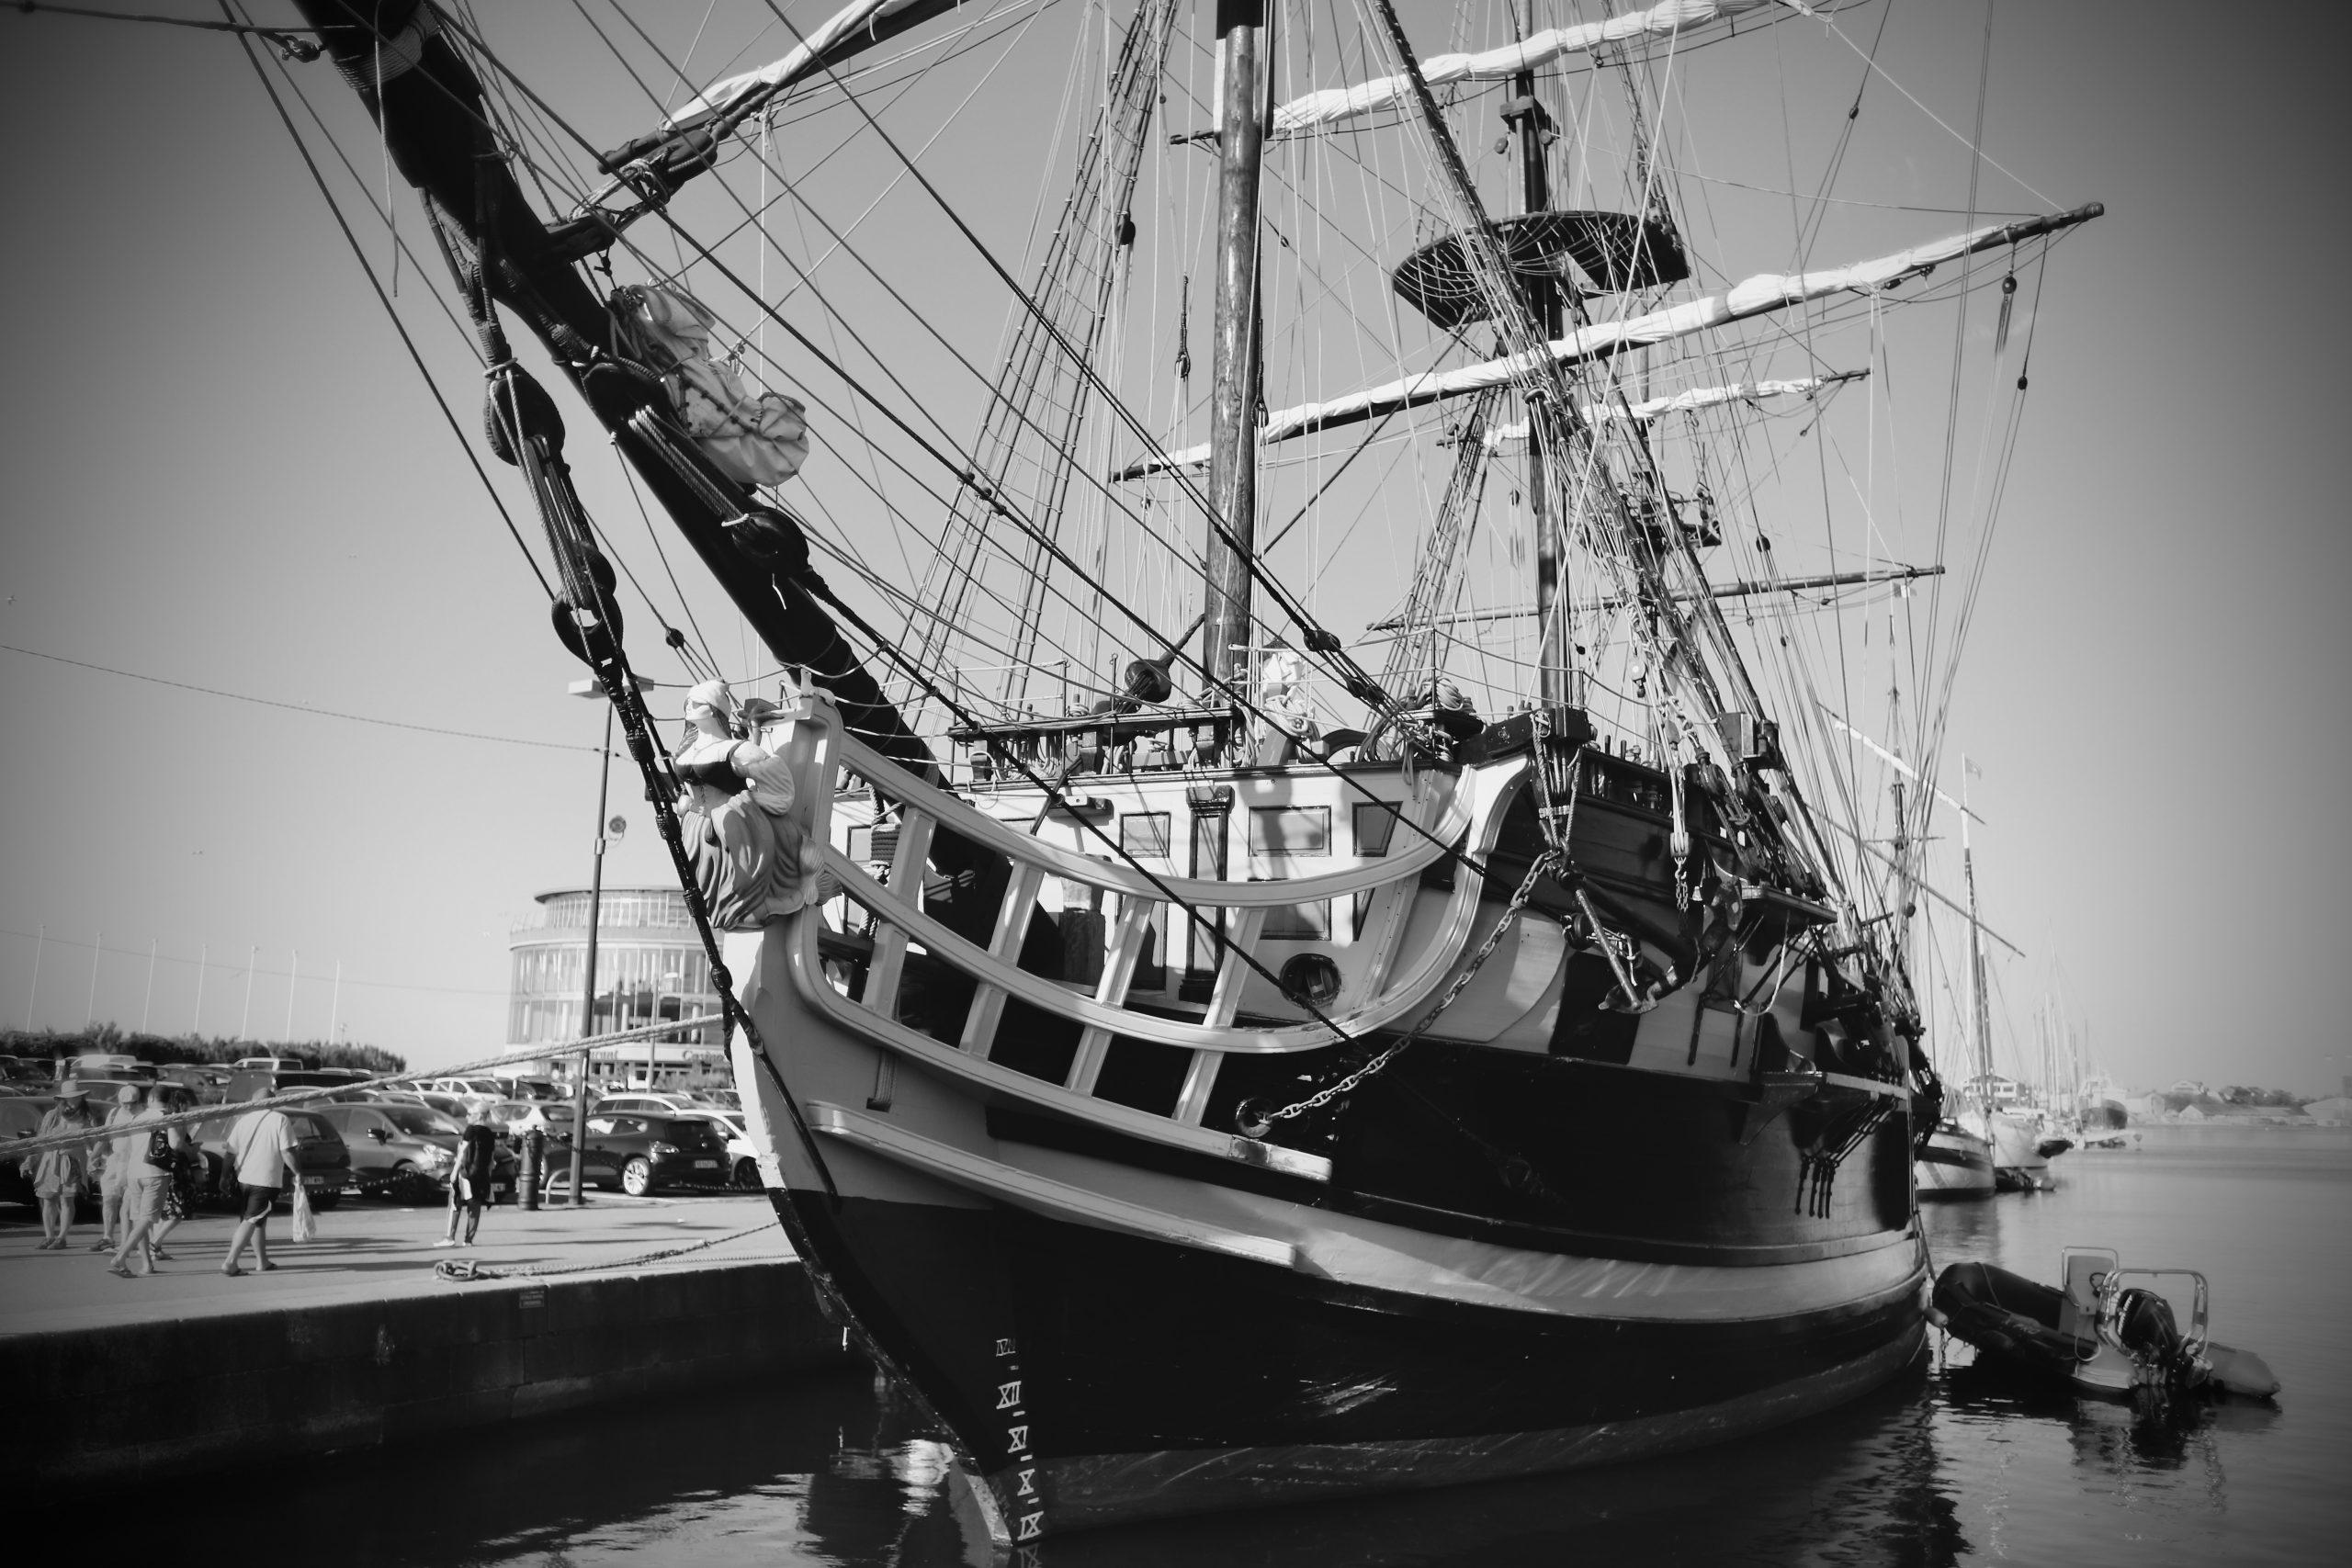 Saint-Malo, the city of pirates